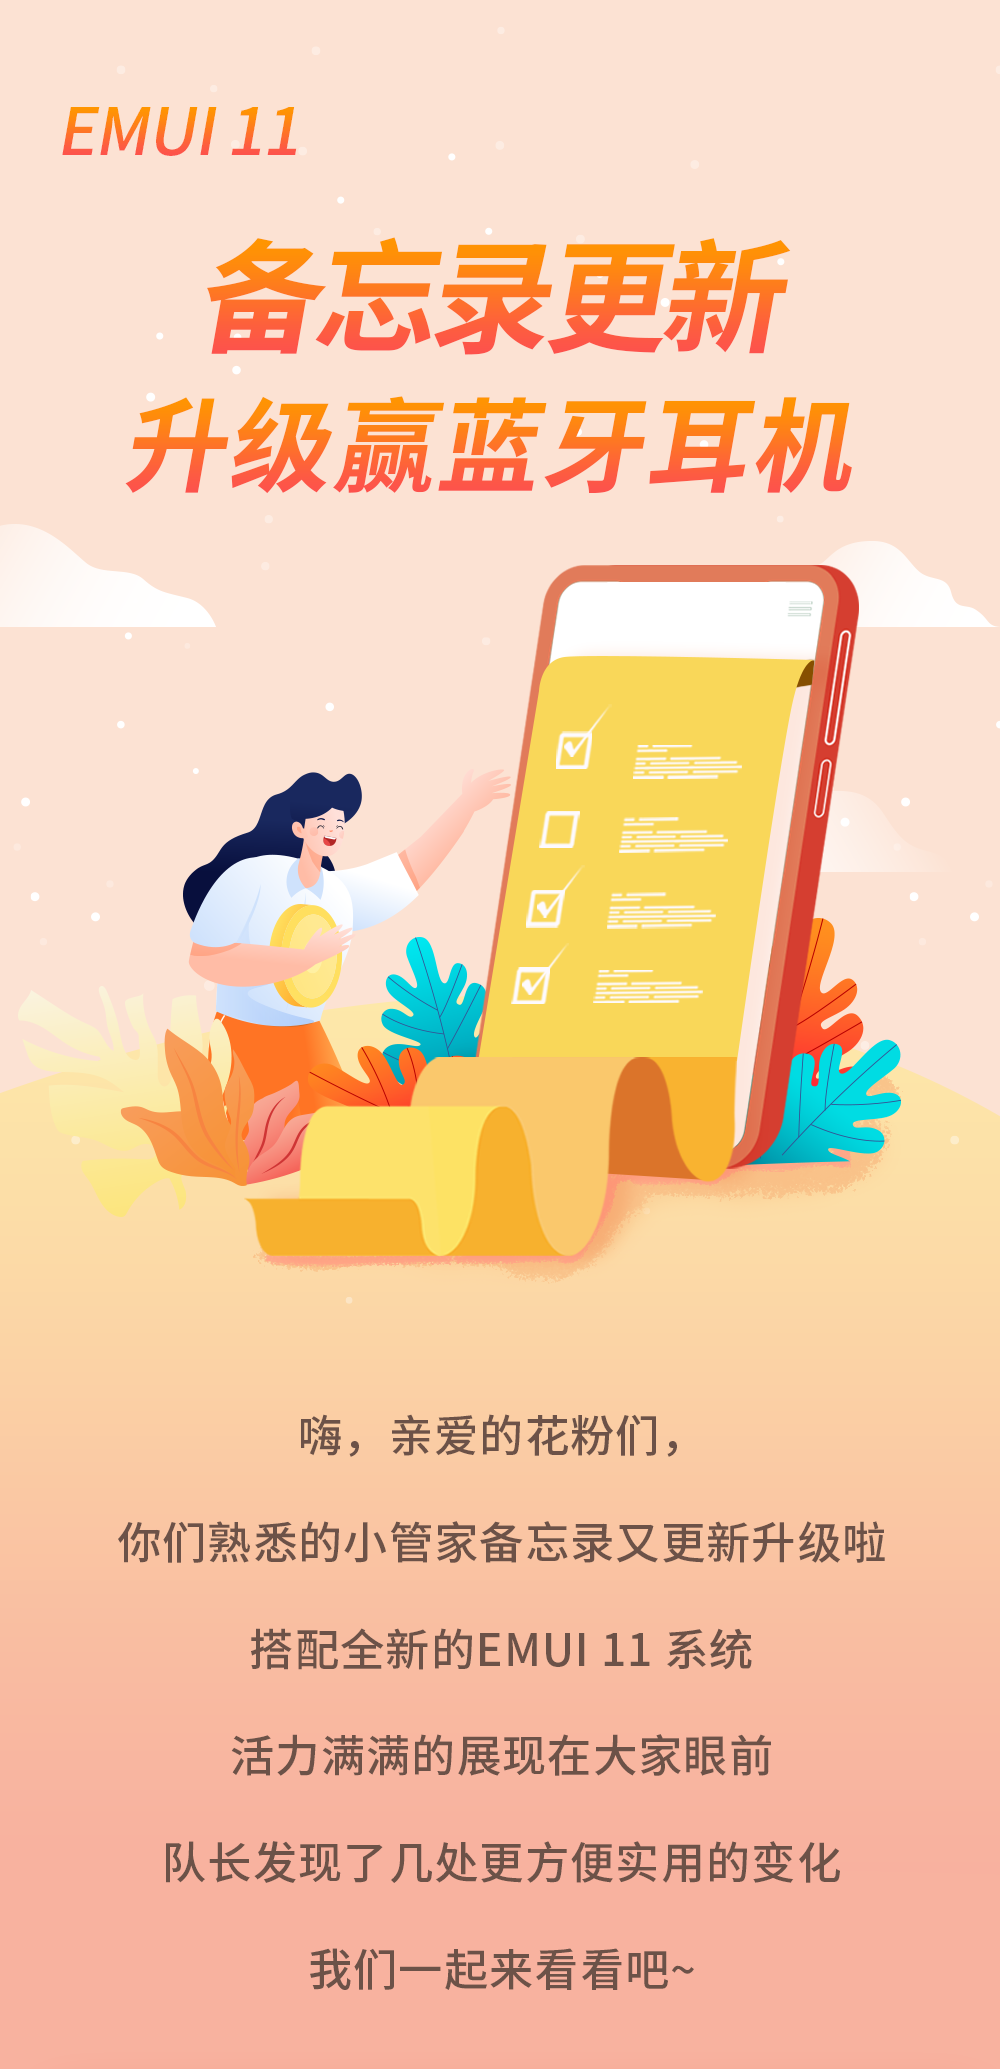 EMUI11备忘录更新升级_01.png